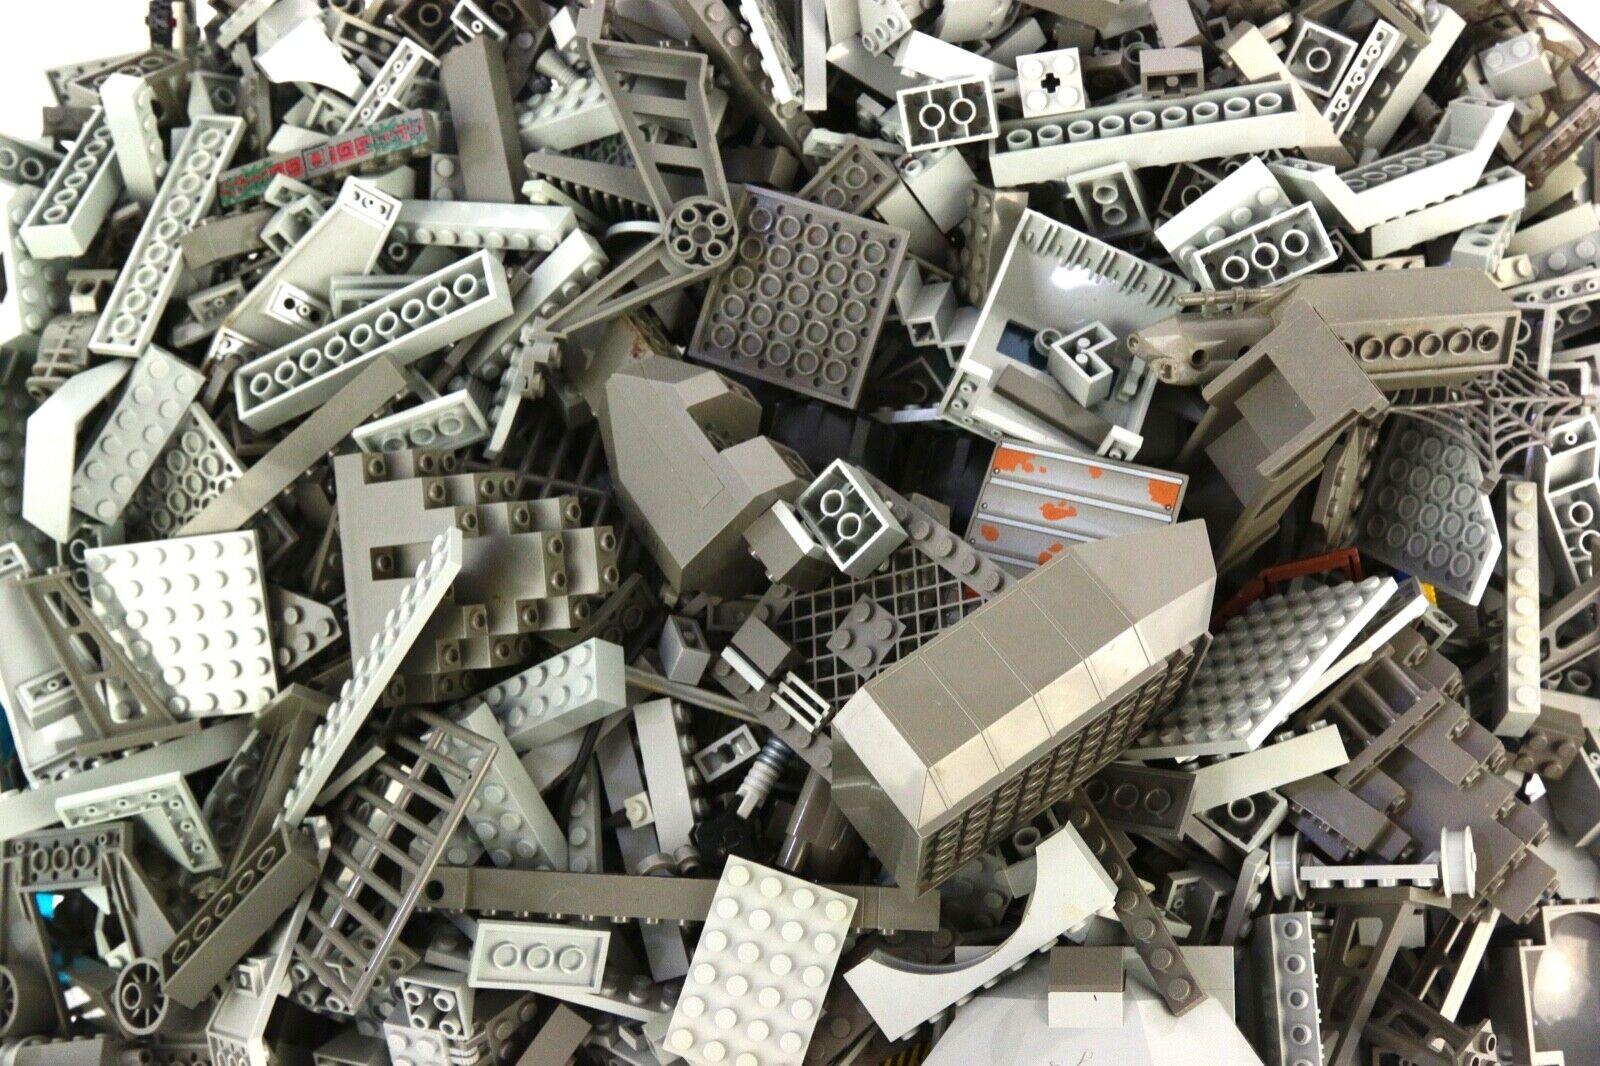 Legolas grises   gris oscuro, 5,8 libras, mezcla de piezas al azar.